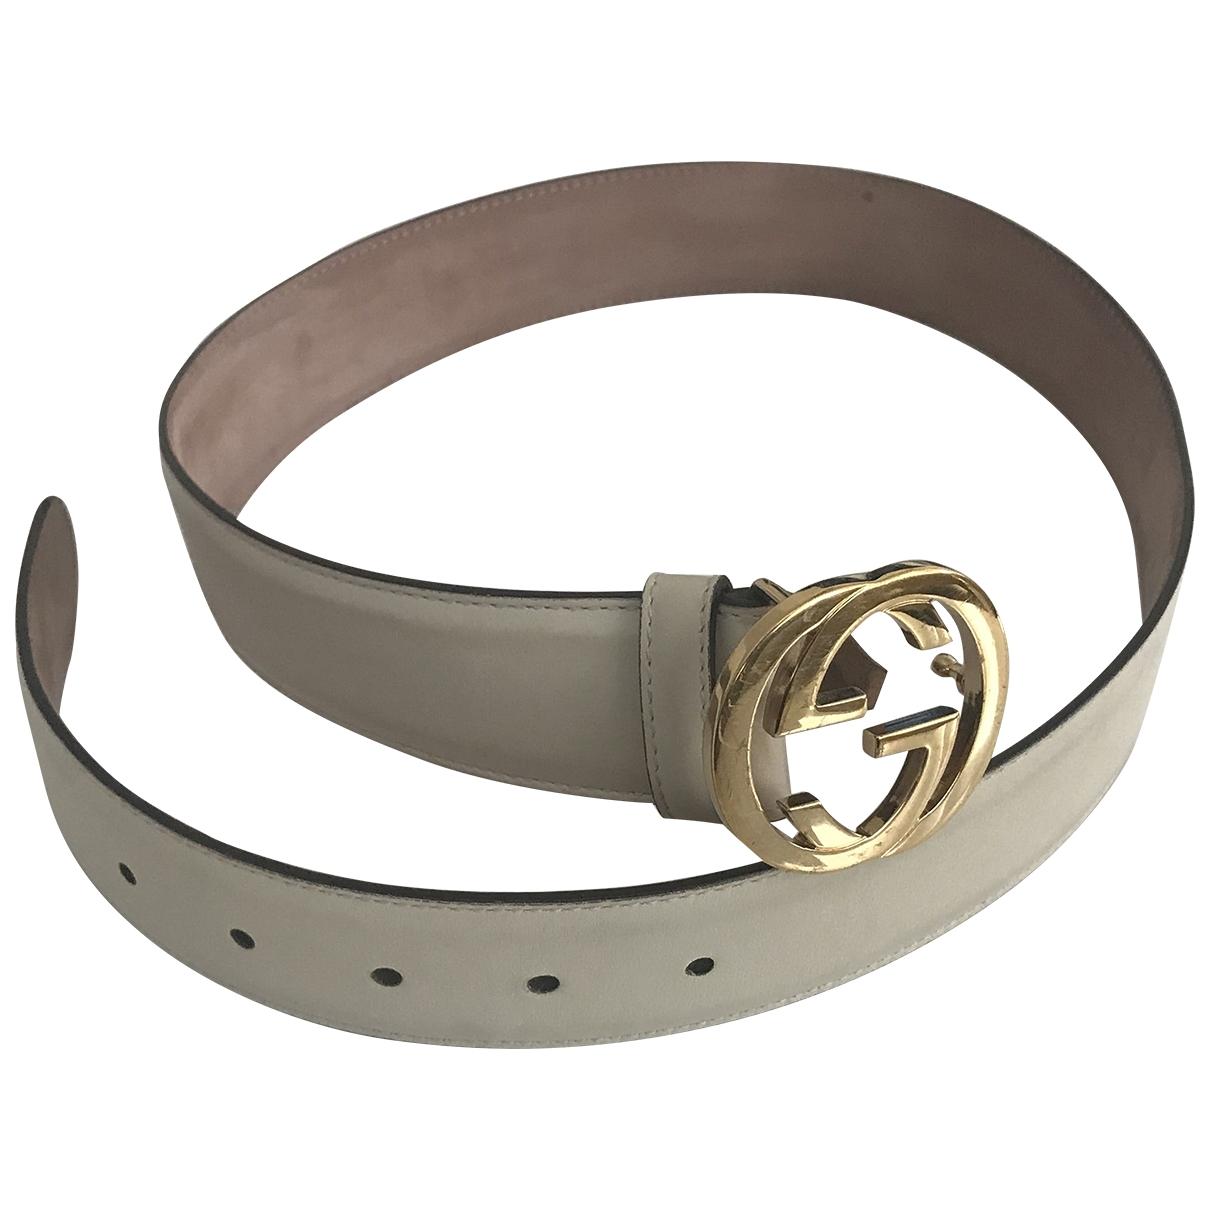 Gucci Interlocking Buckle White Leather belt for Women 85 cm